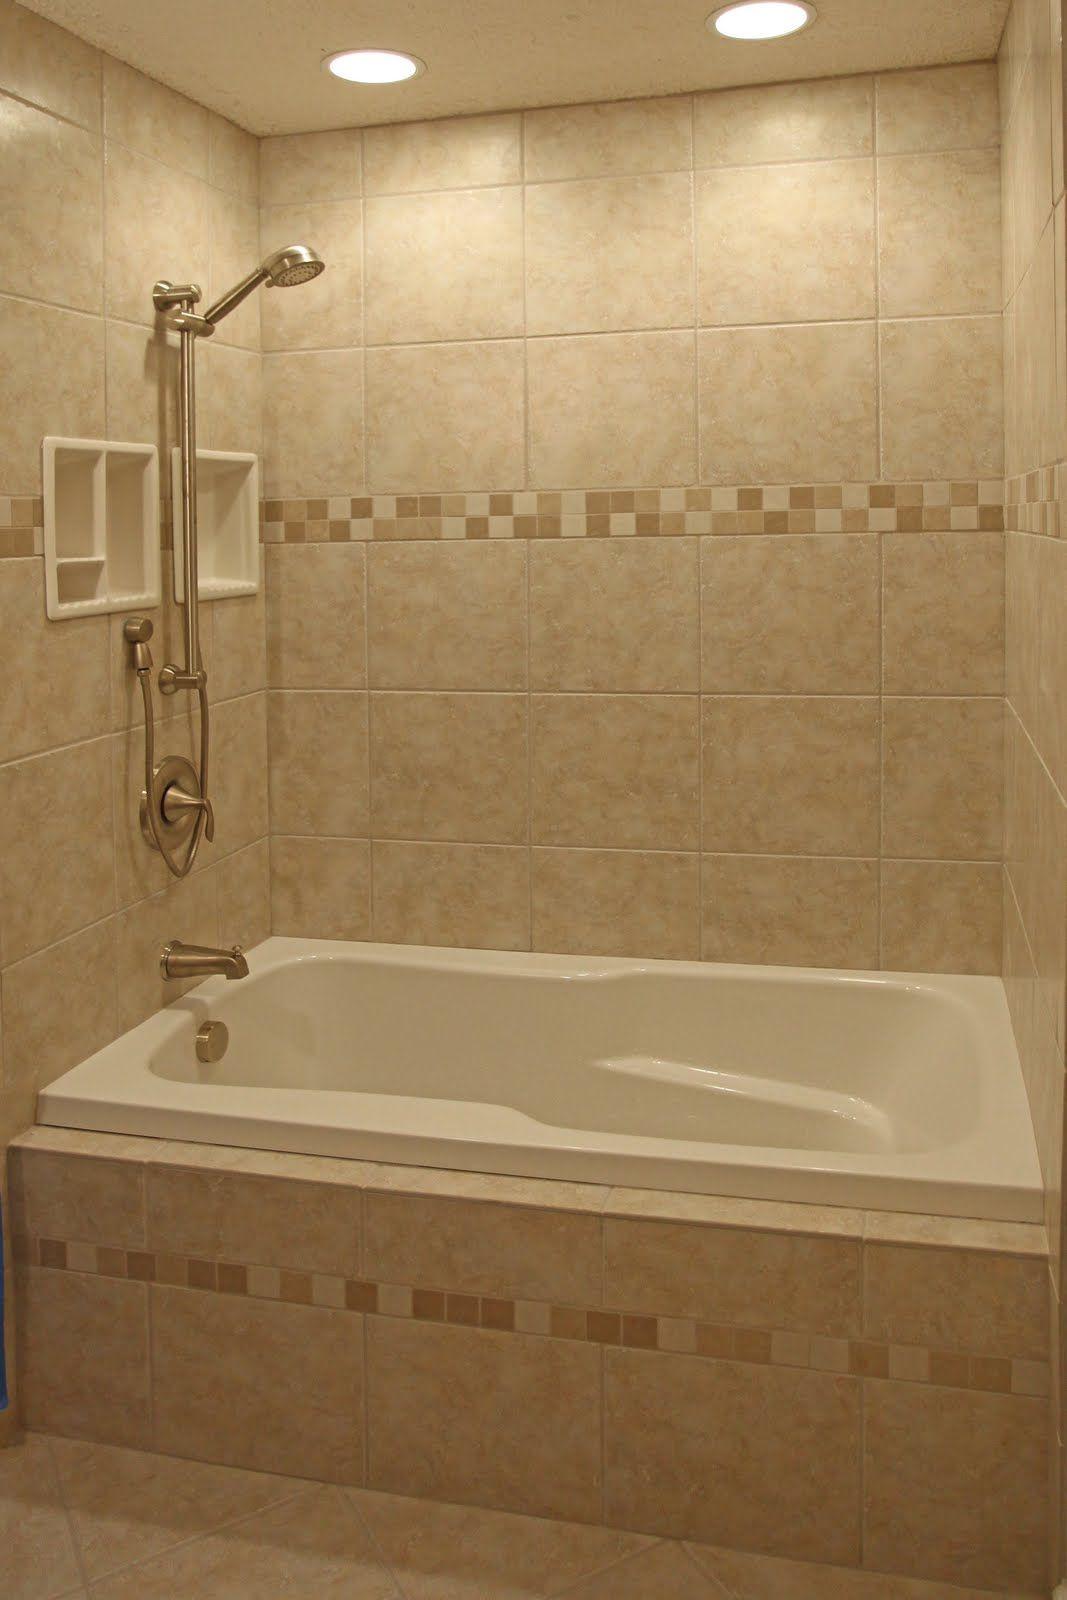 Bathroom Ceramic Floor Tile Ideas  41 Best Ceramic Tiles for Bathroom Flooring Ideas